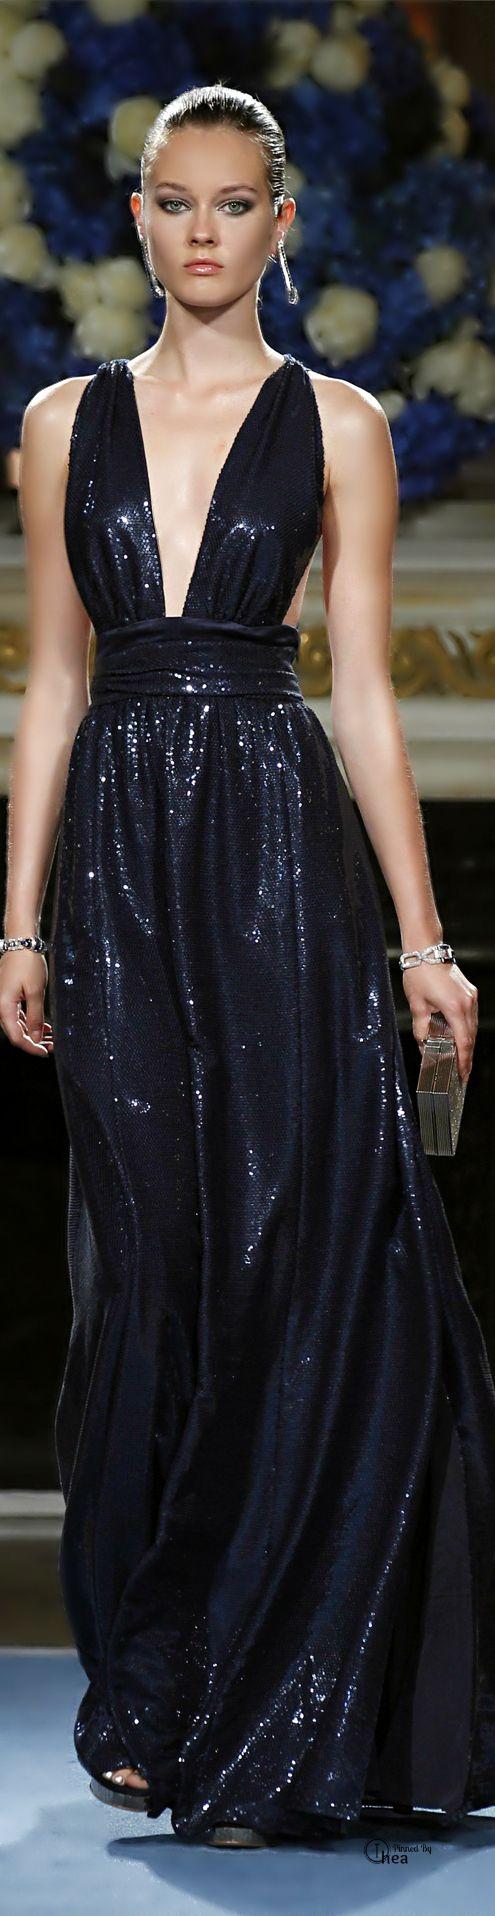 Miss Millionairess: Black tie Affair: Salvatore Ferragamo black glamour gown black reel a